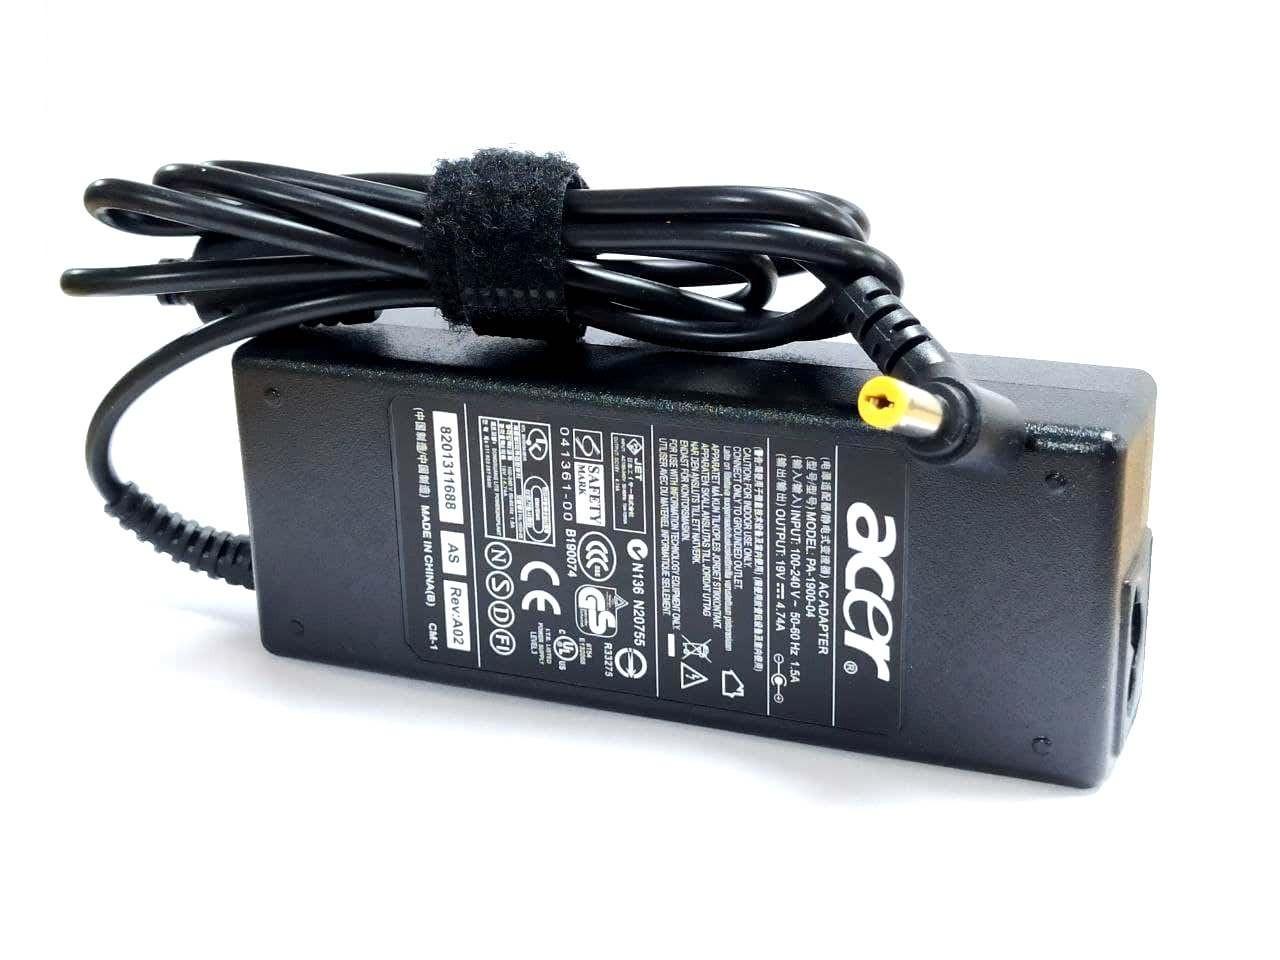 Блок питания для ноутбука Acer Aspire V5-473PG 19V 4.74A 90W